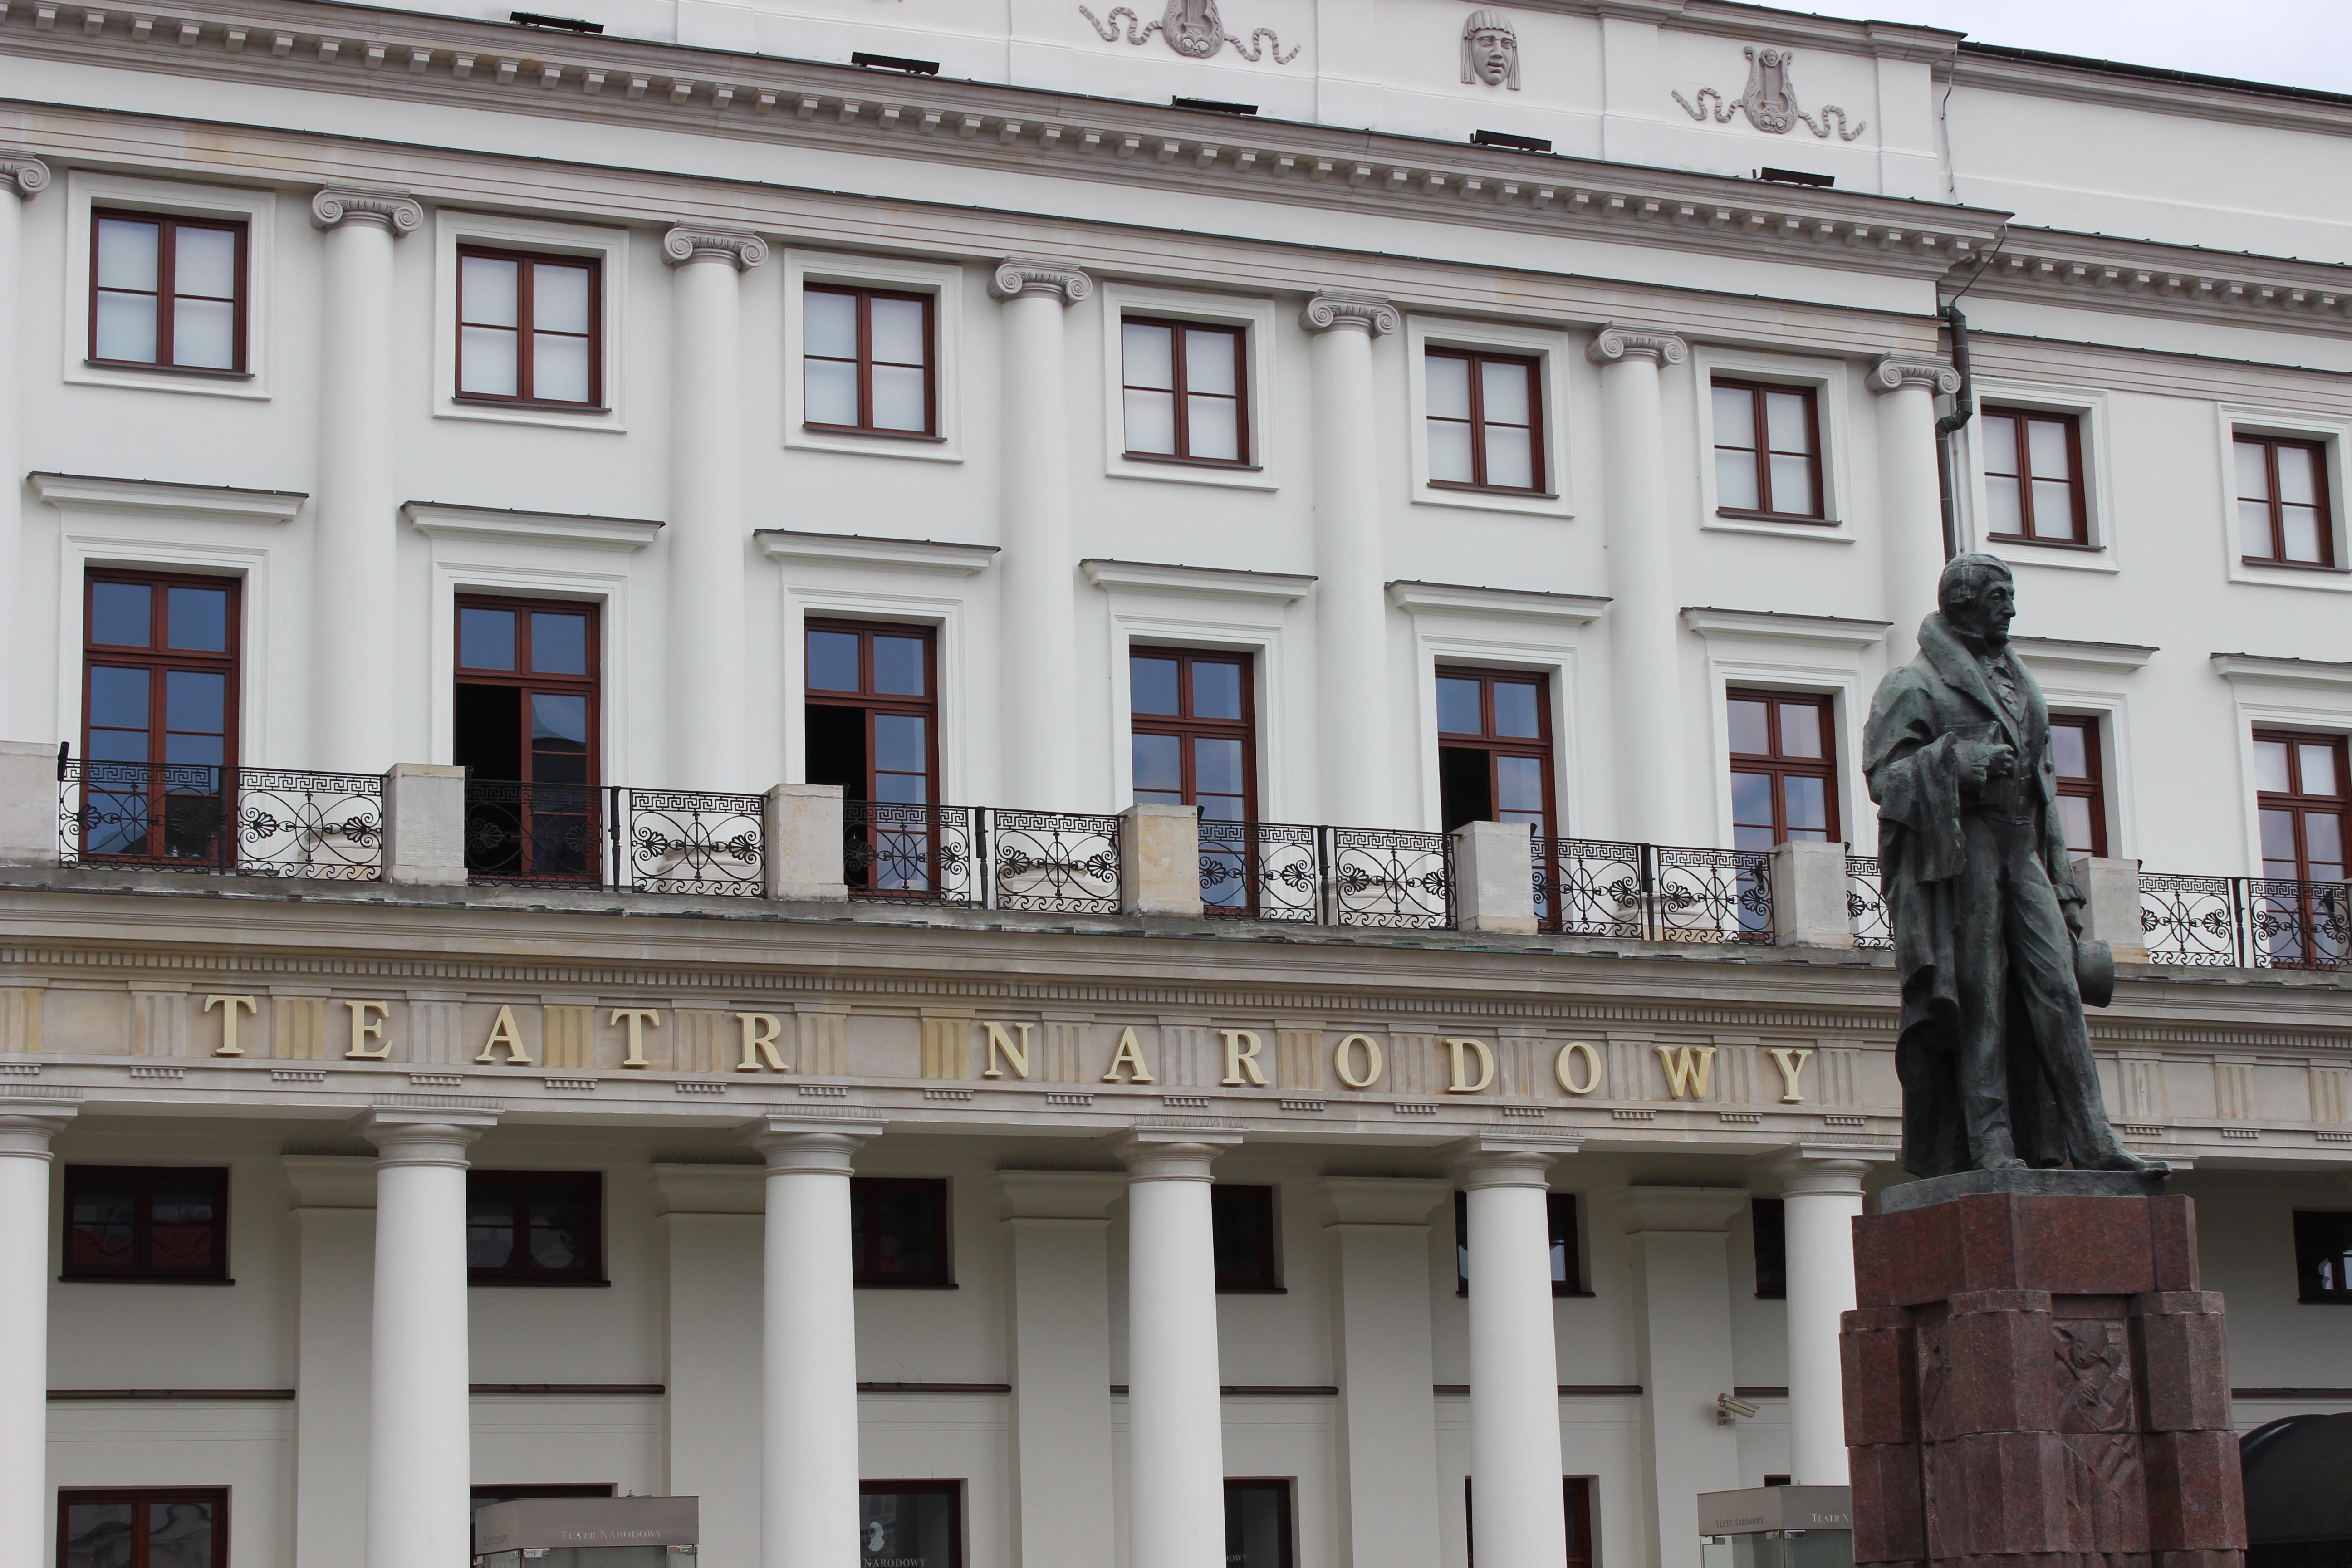 Monument to Wojciech Bogusławski outside the National Theatre in Warsaw. Photographer: paplo.